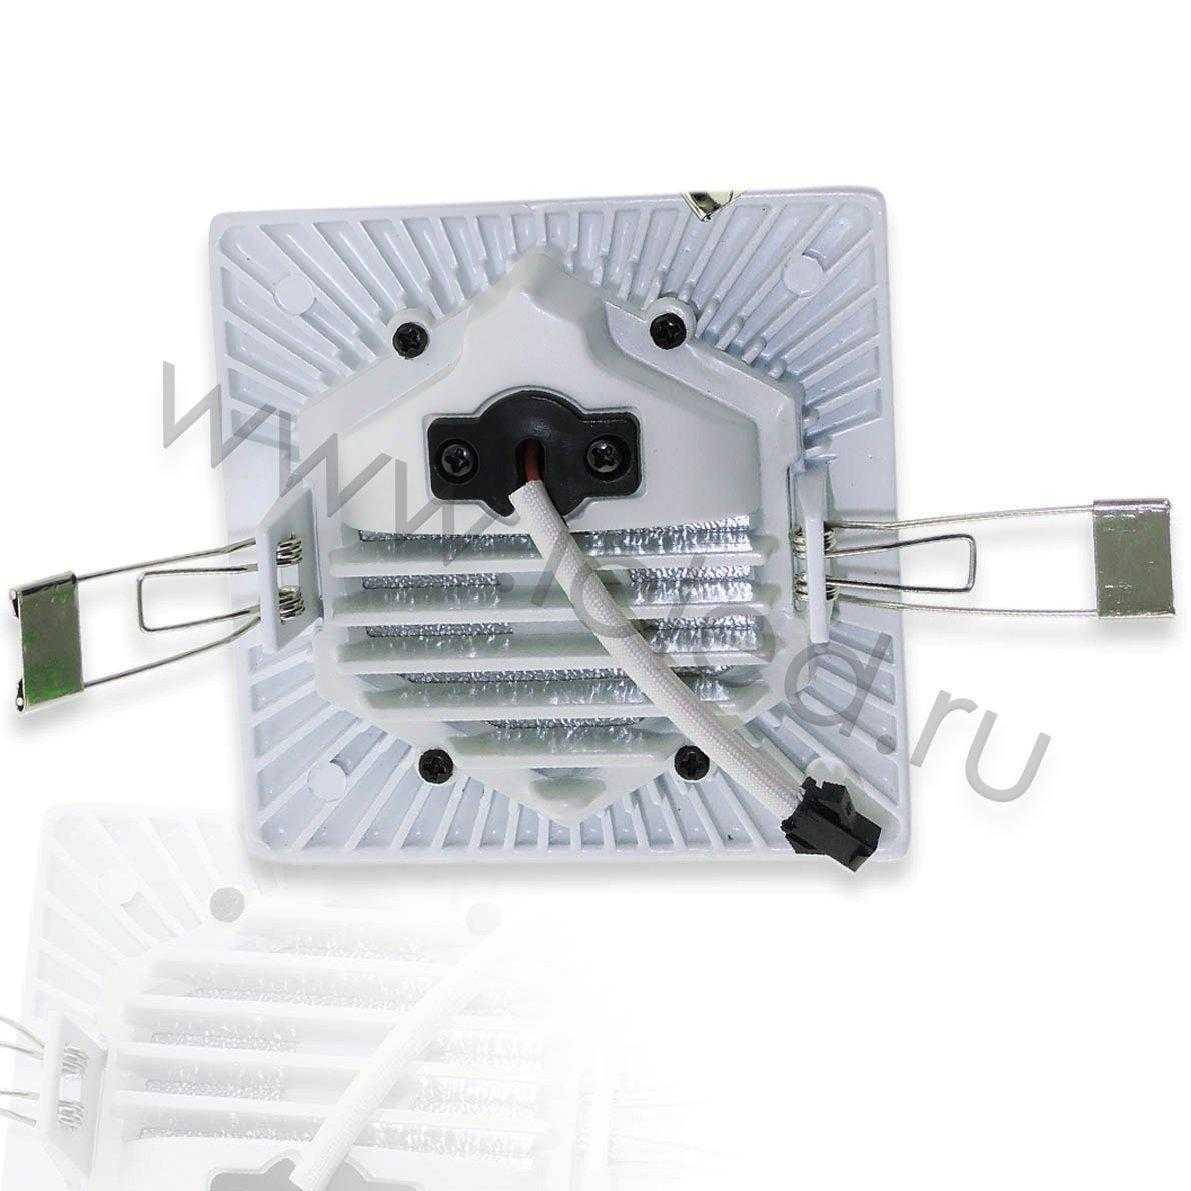 Светодиодный светильник потолочный IC-RSW L100 (6W, Warm White)